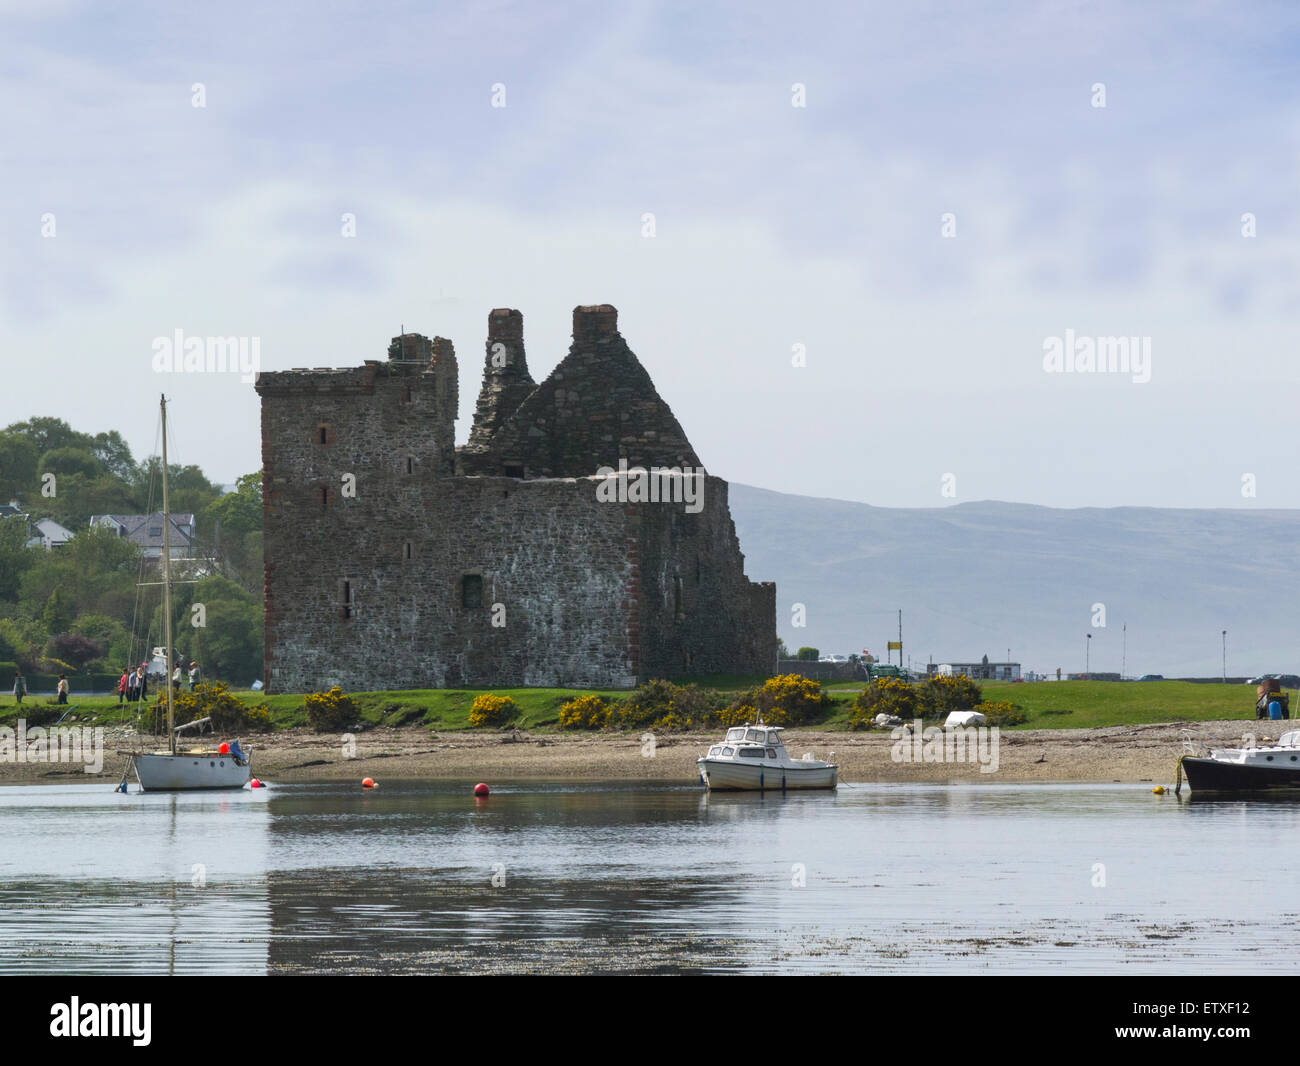 View Across Loch Ranza To Lochranza Castle A 16thc L Plan Tower House On A